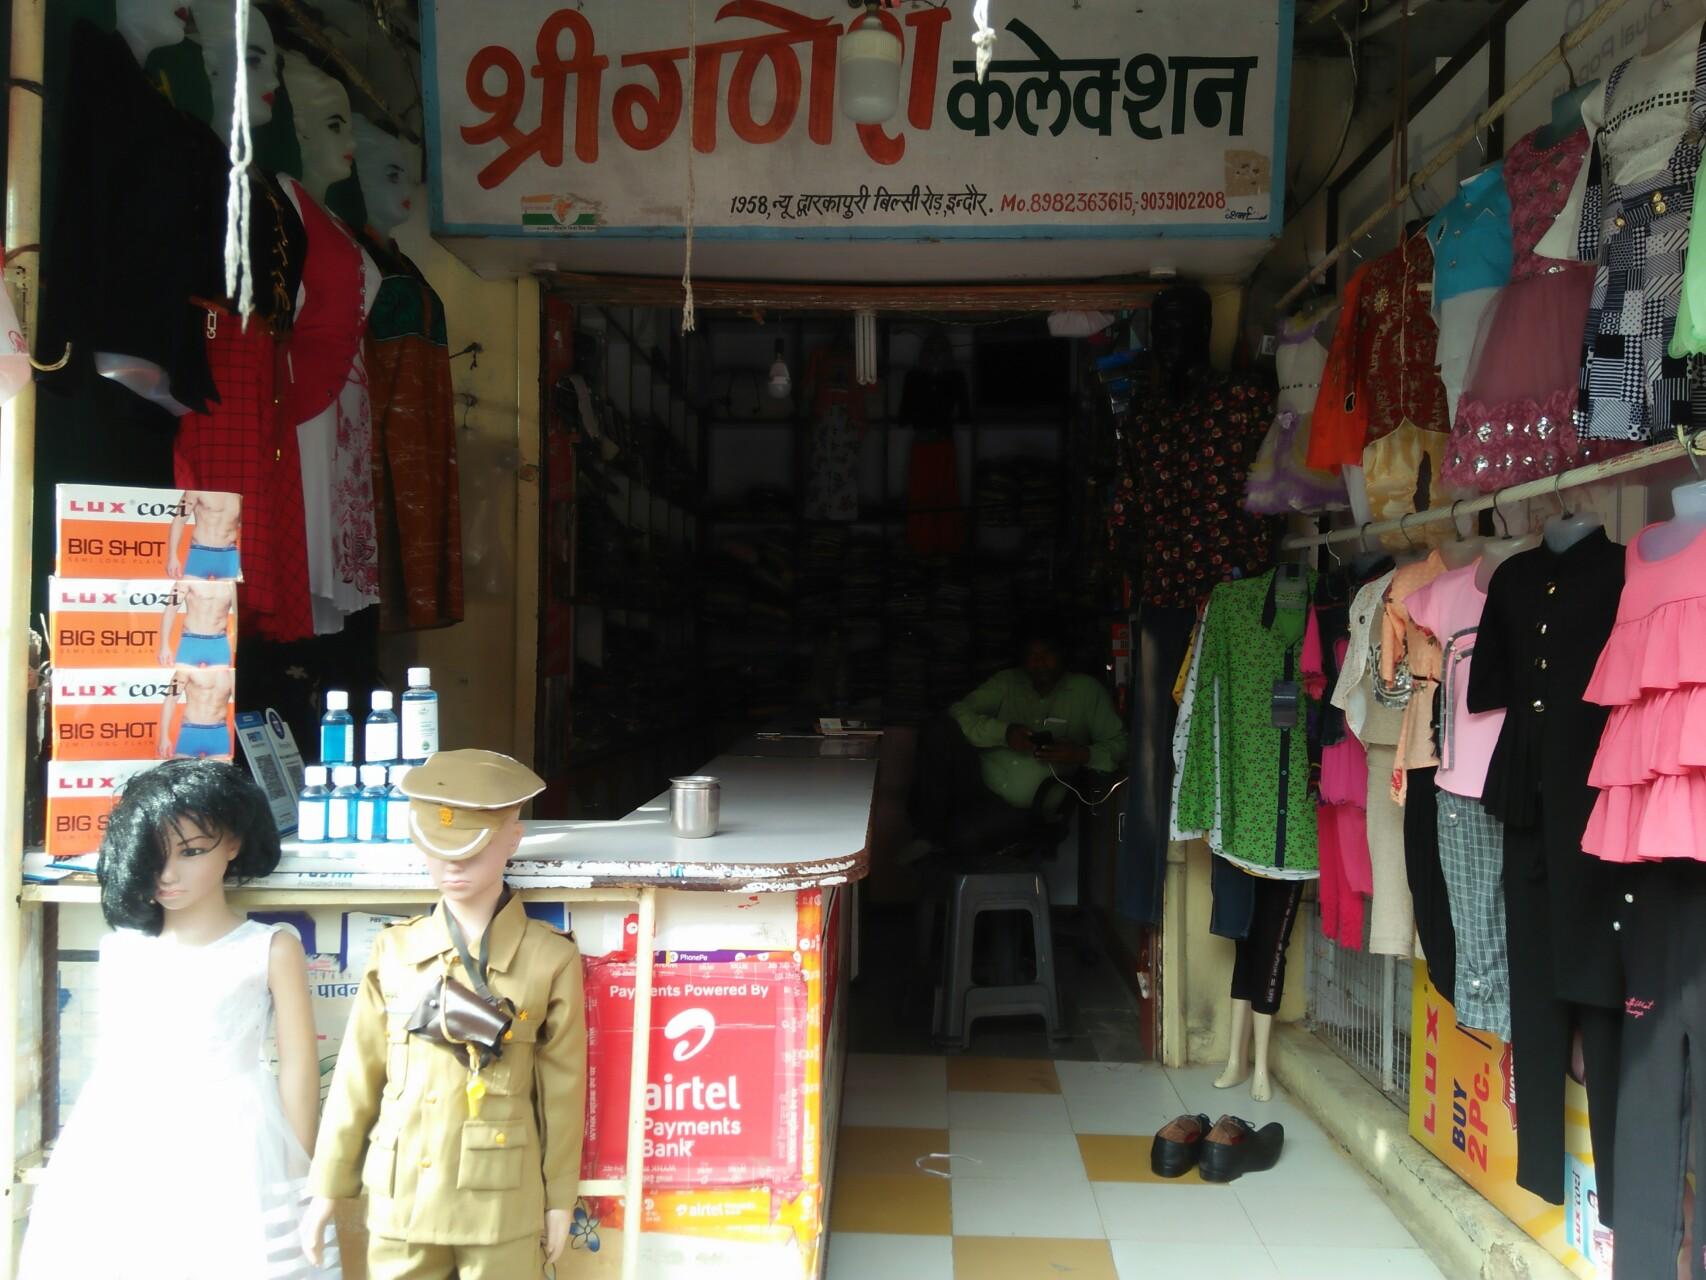 Shri Ganesh collection